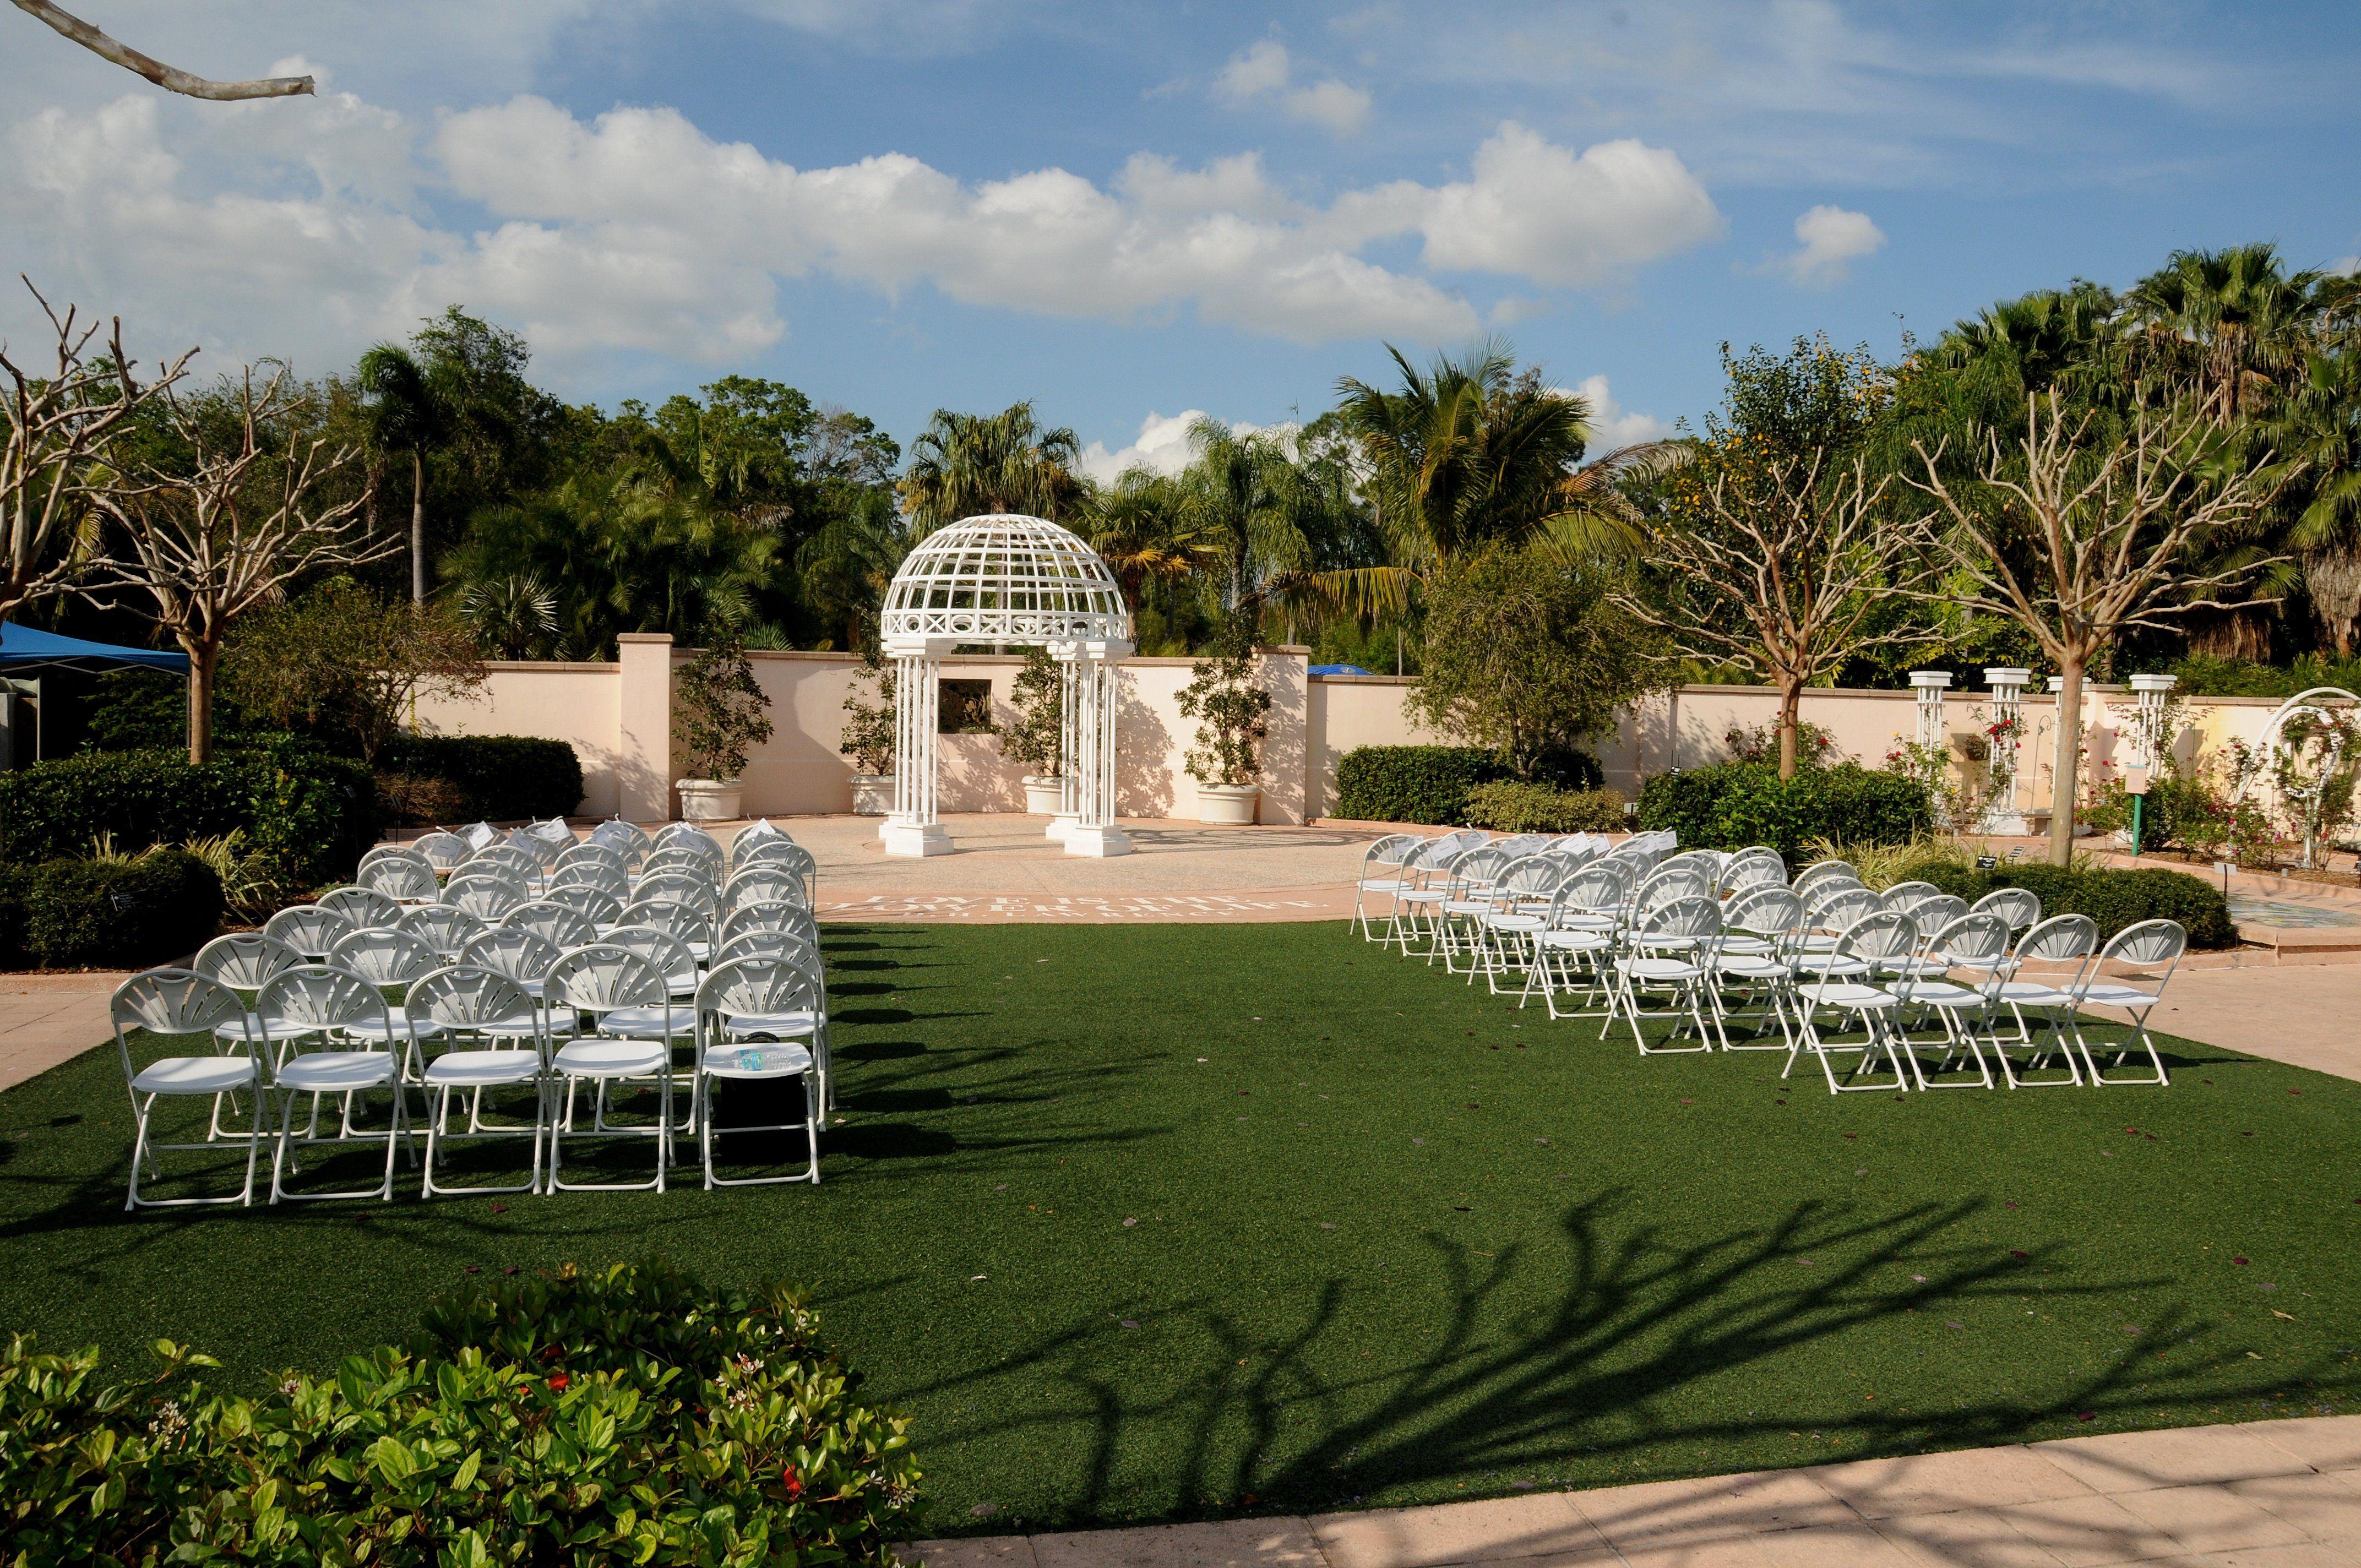 f6ca760bf2226f8d04a3bf1199daf5c3 - The Florida Botanical Gardens In Largo